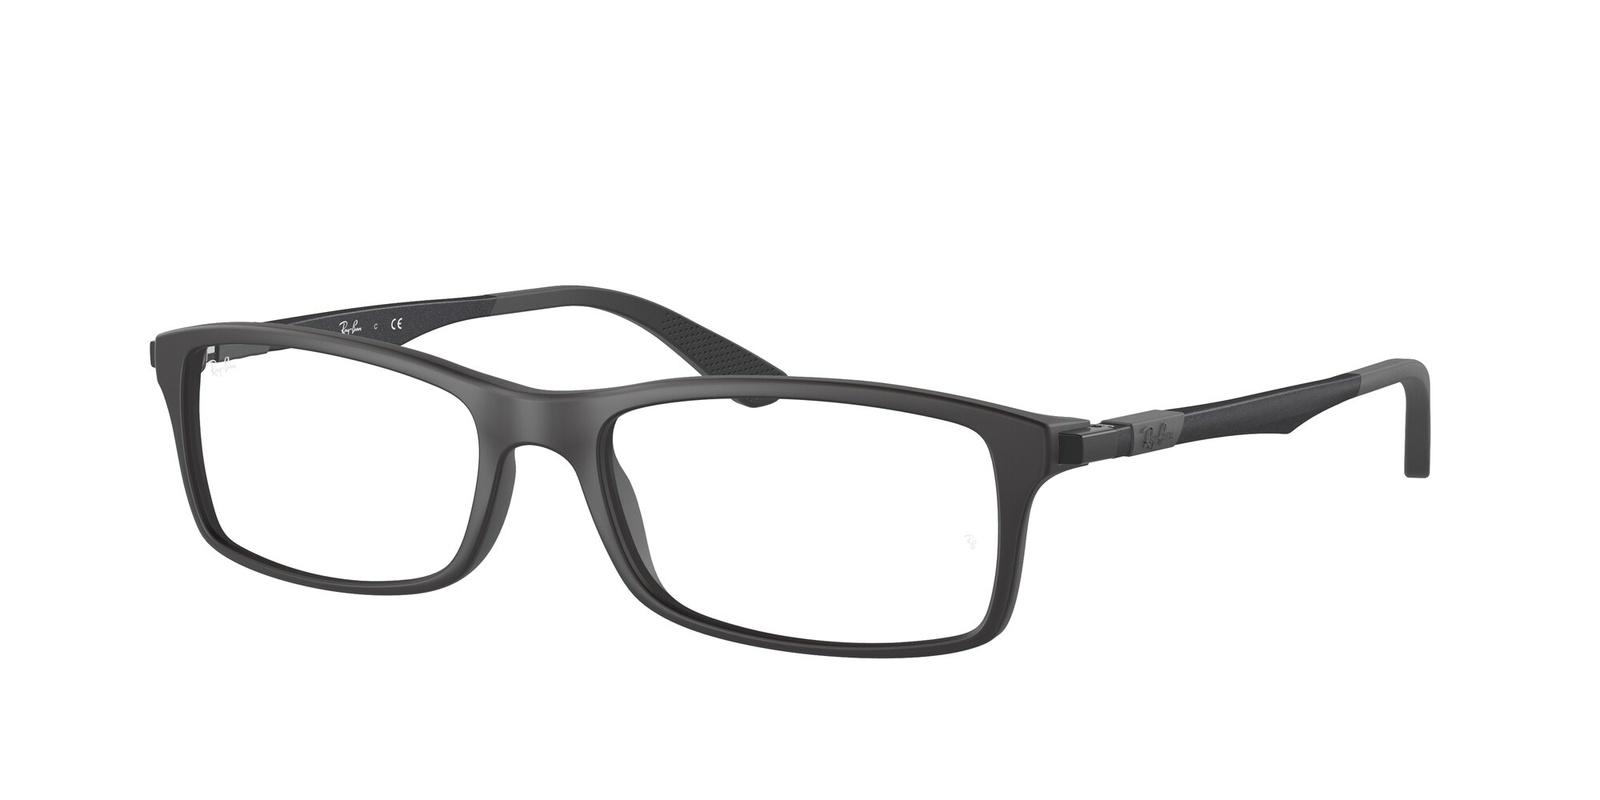 Ray Ban RX7017 Eyeglasses